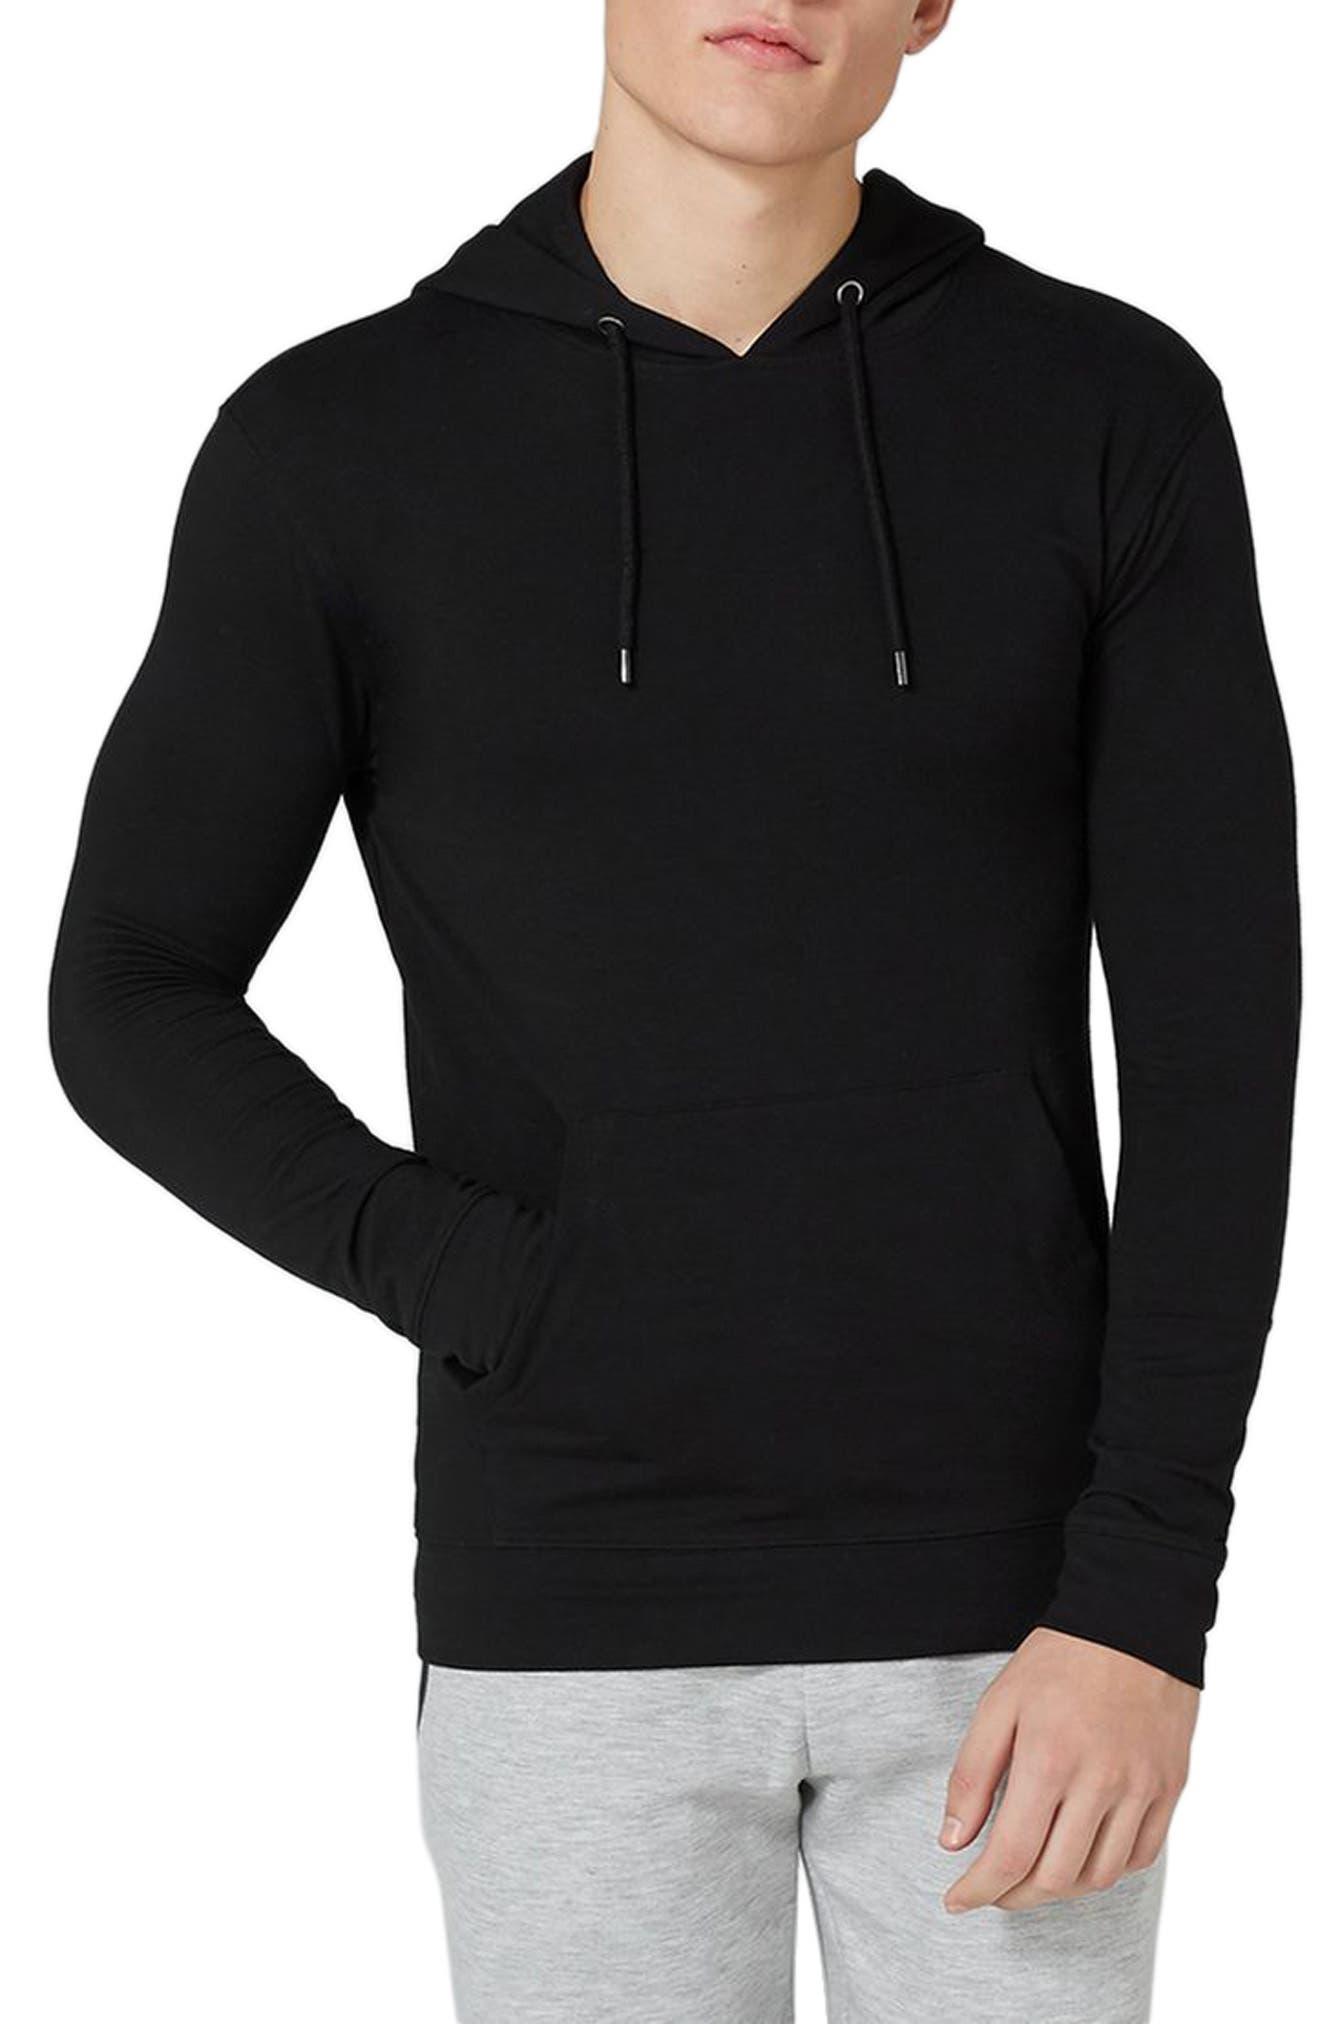 Ultra Muscle Fit Hoodie,                         Main,                         color, Black